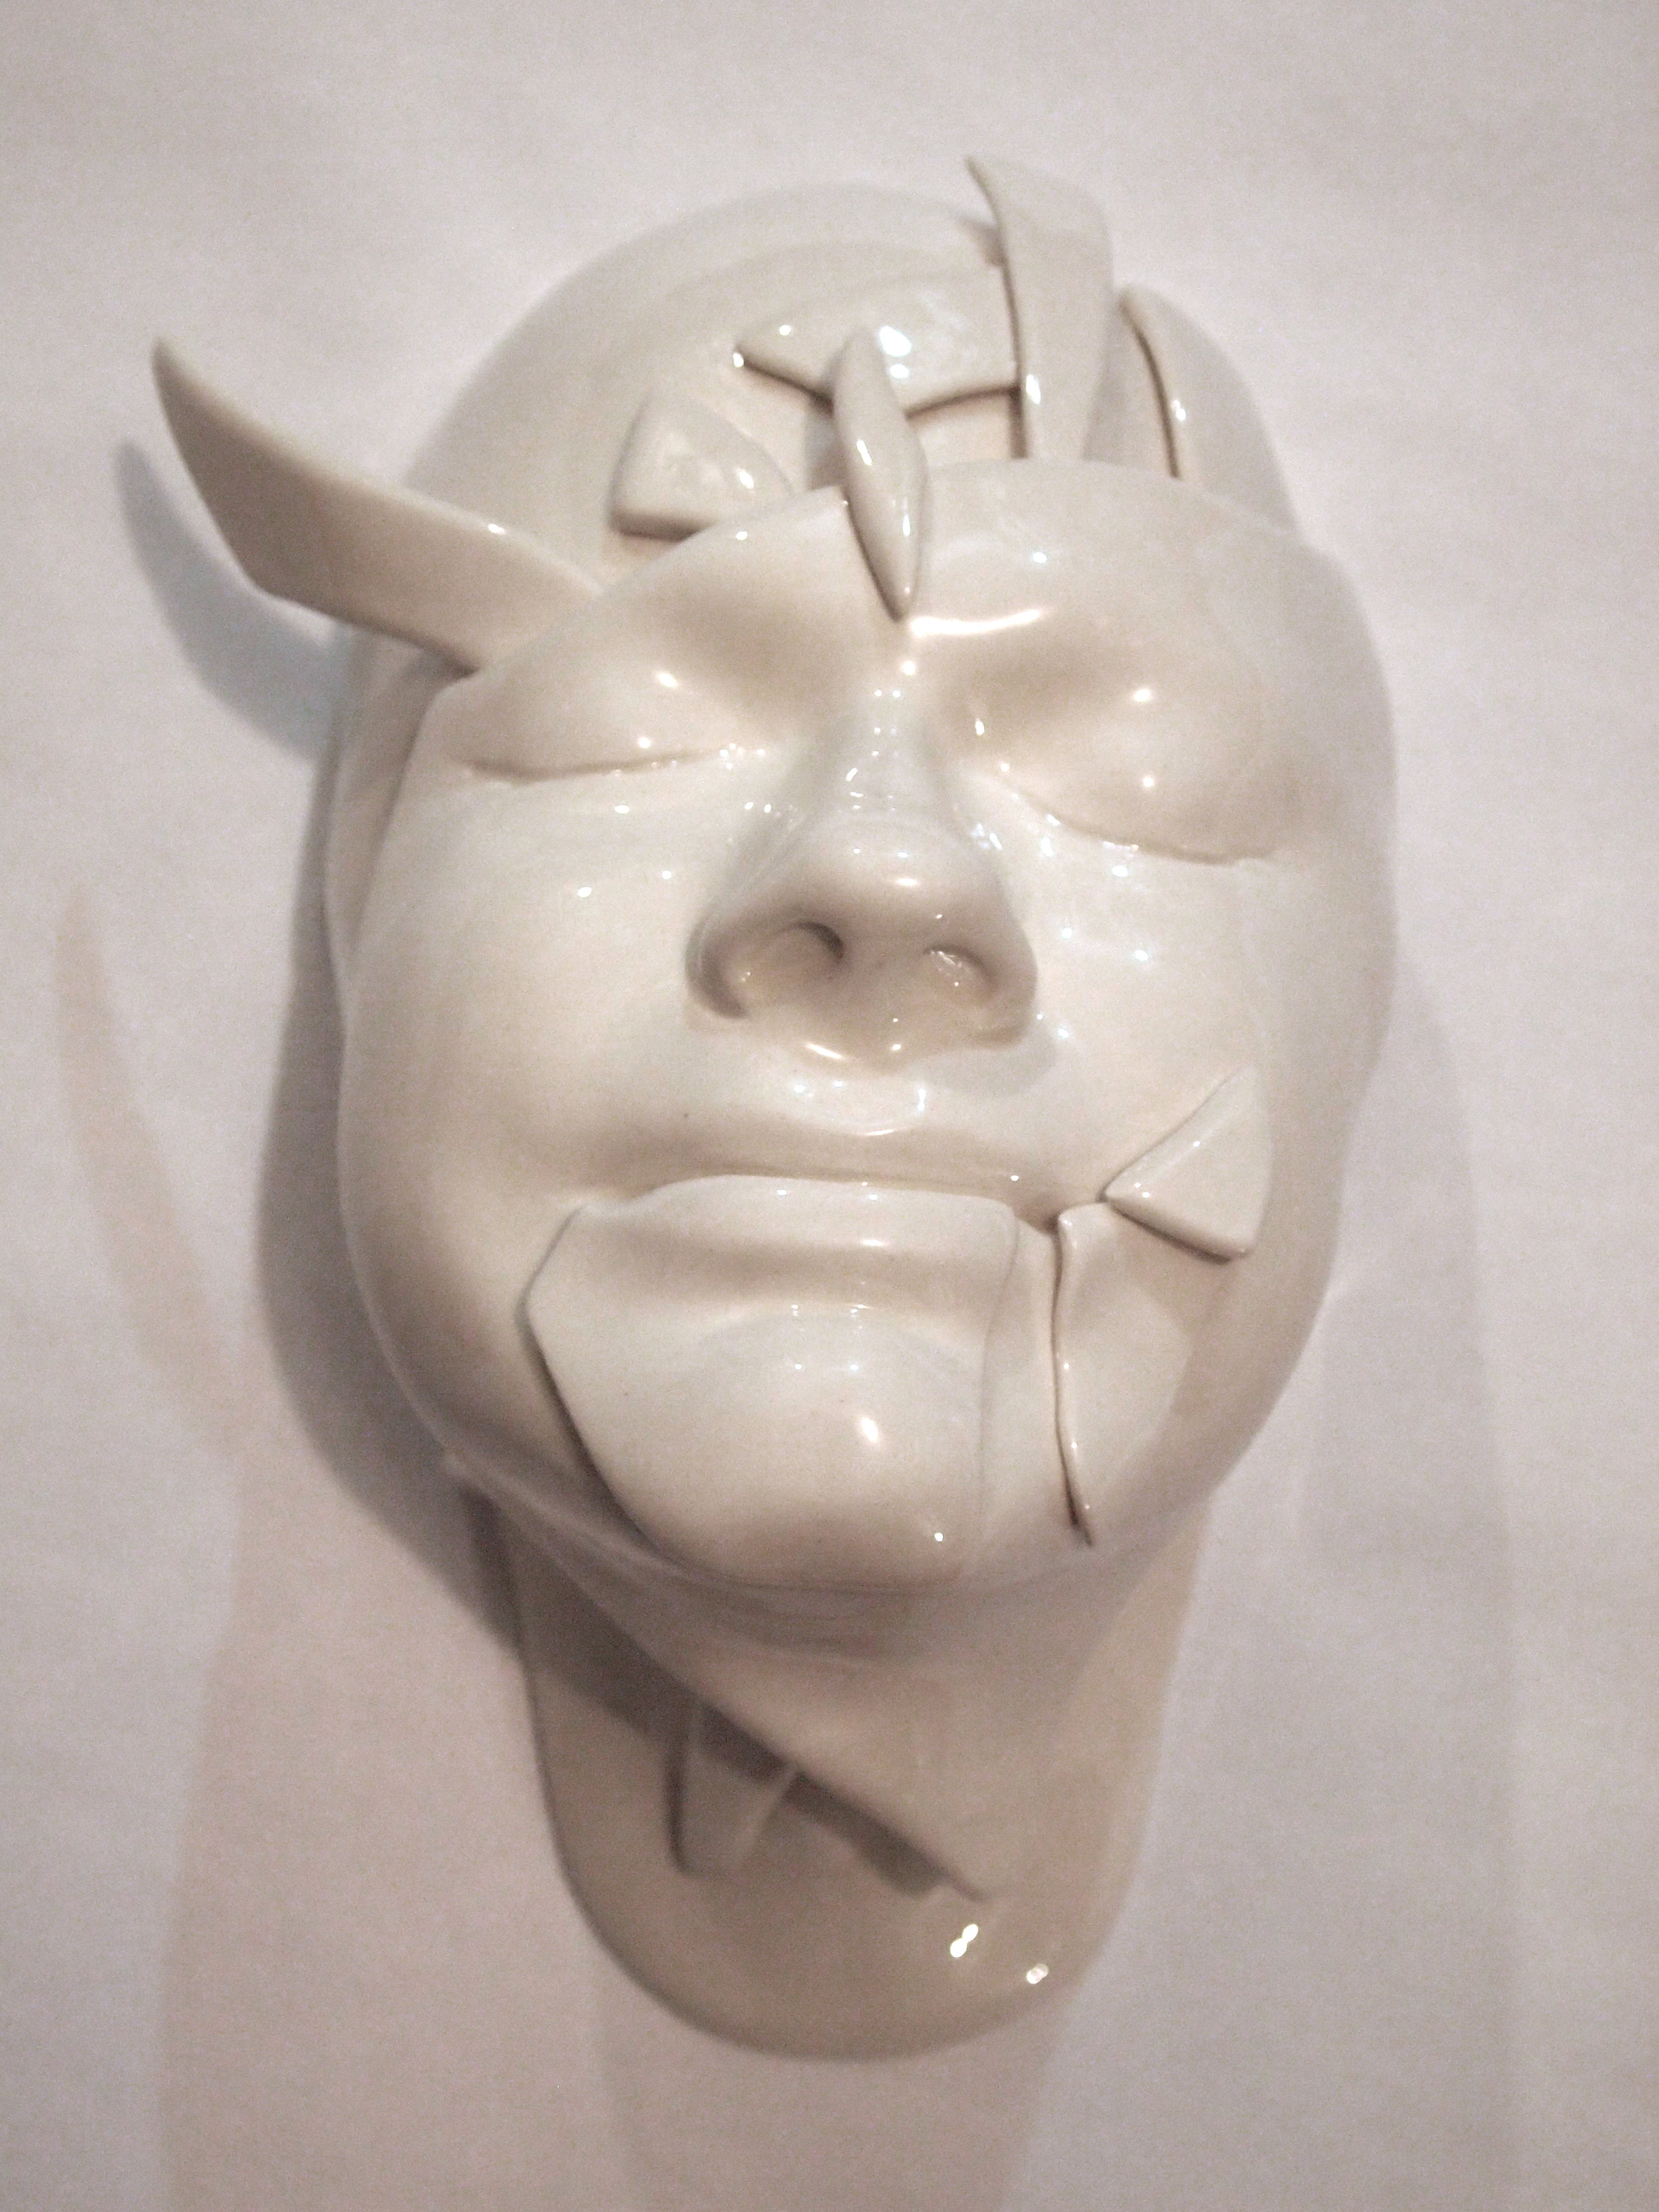 Craig Paul Nowak Ceramic Face art shattered